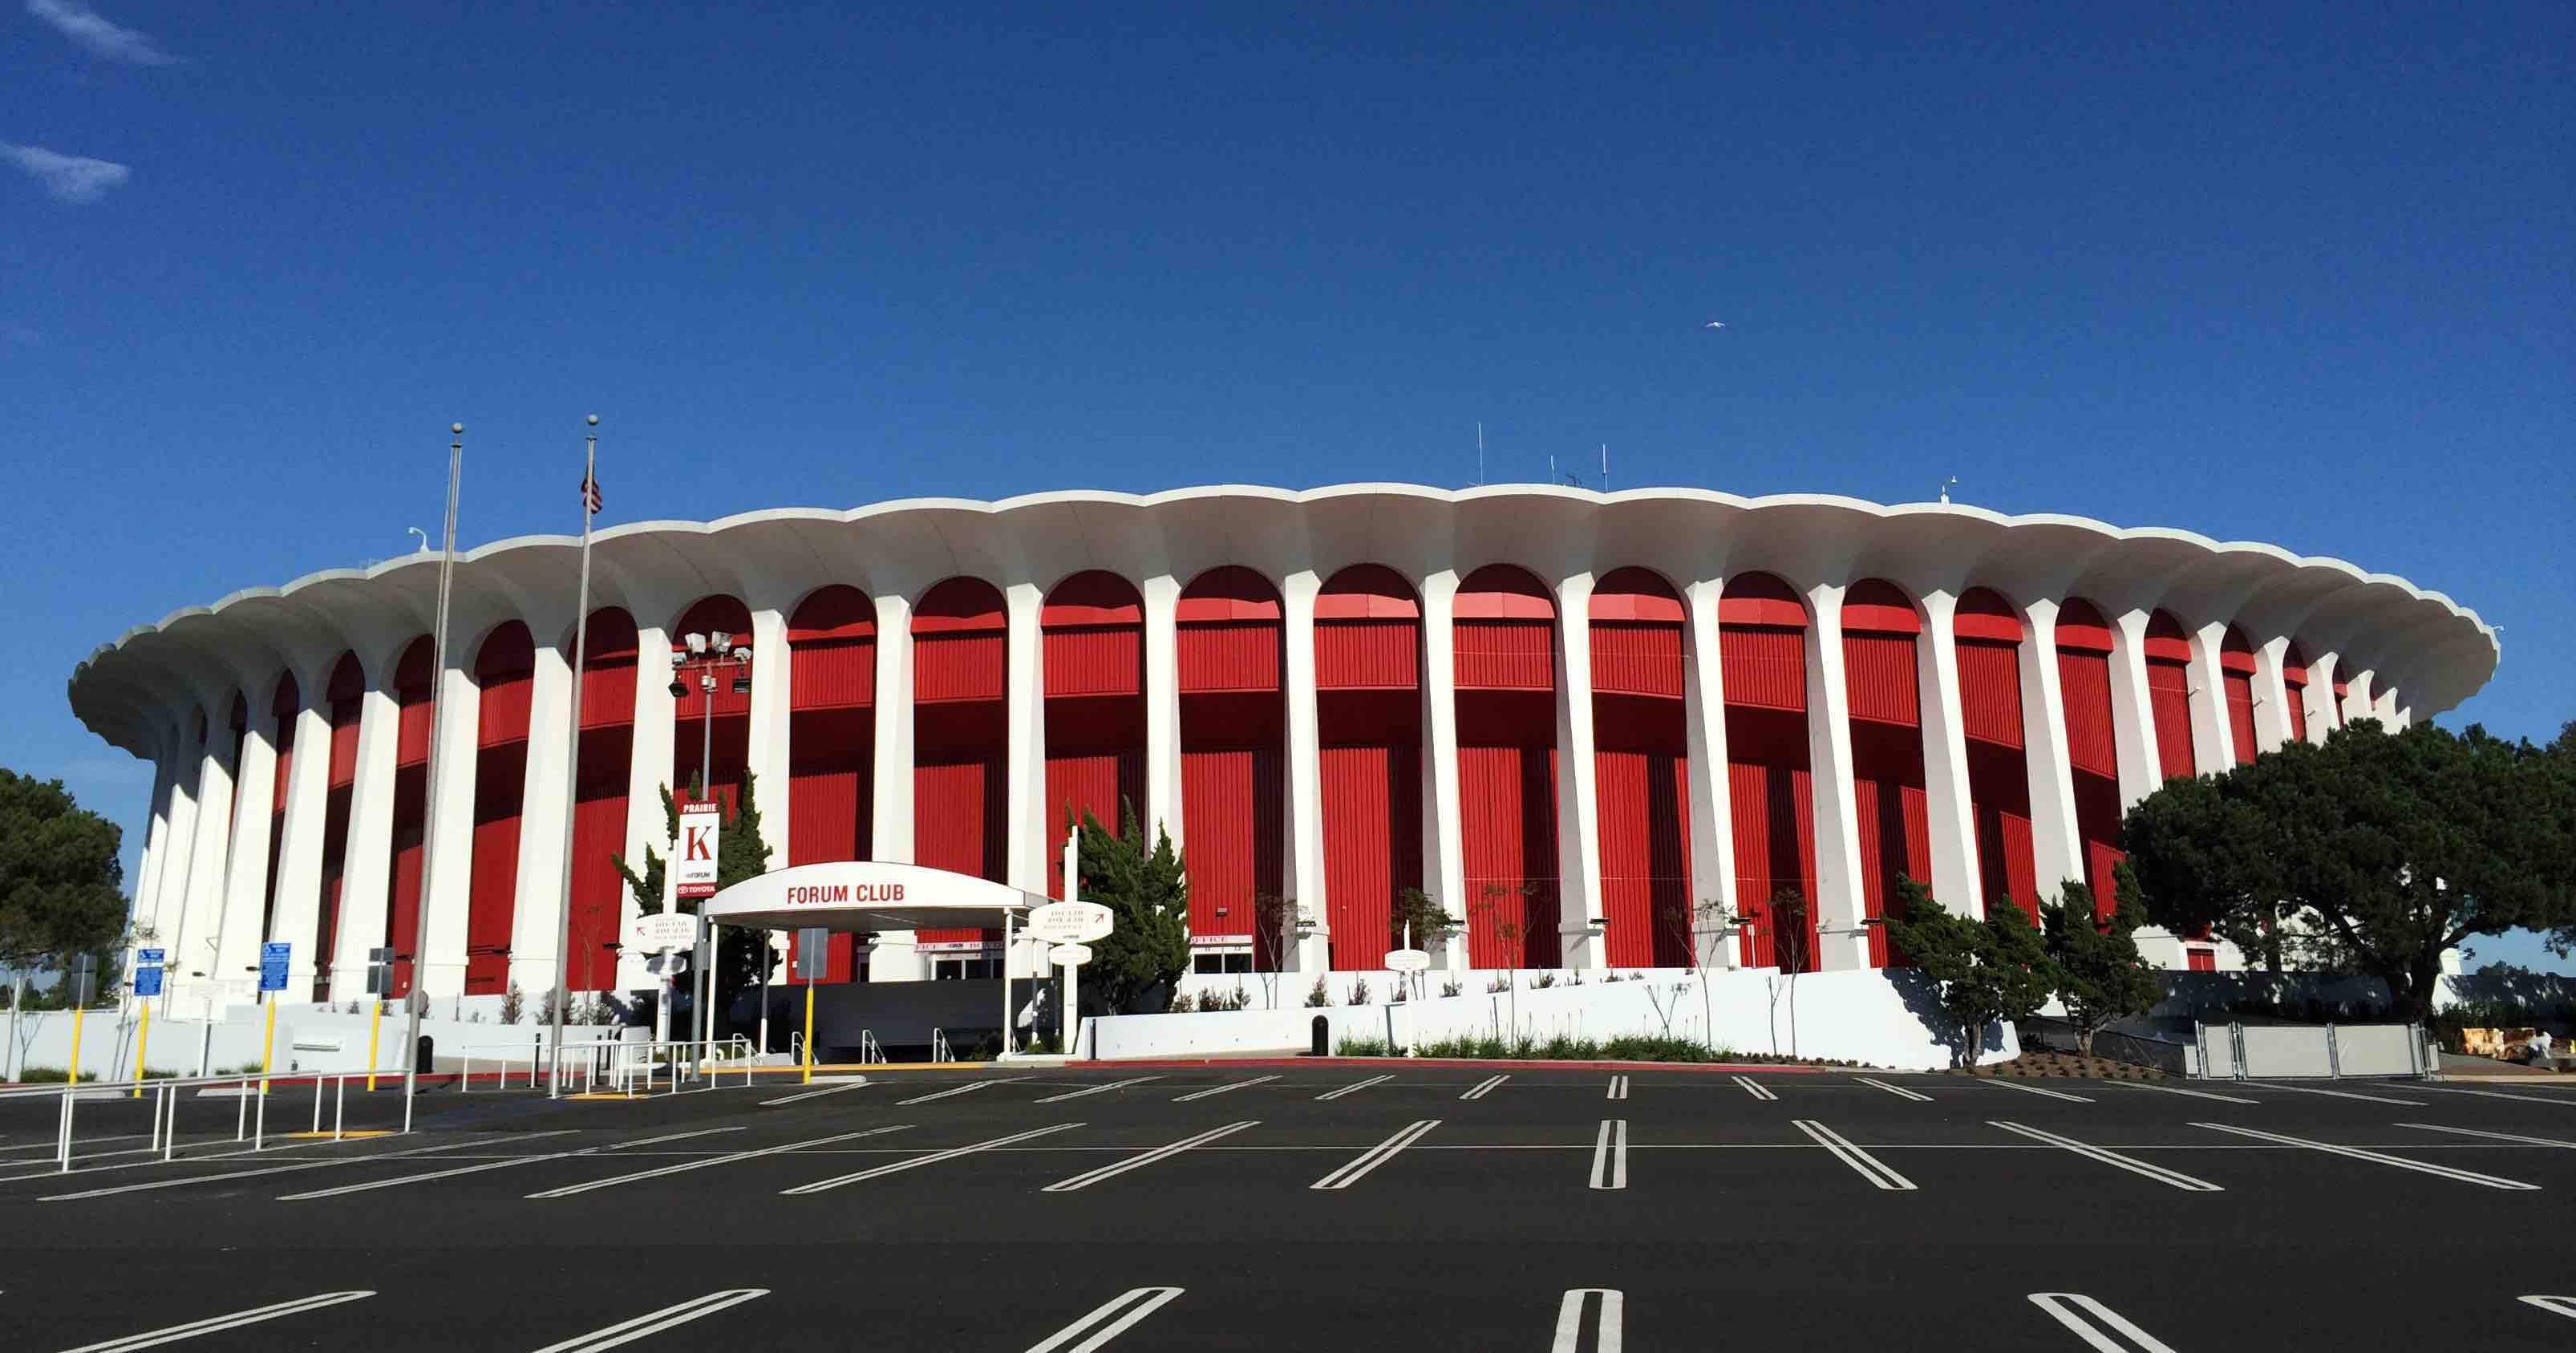 The Forum | Los Angeles CA | We Day 2017 | Selena Gomez